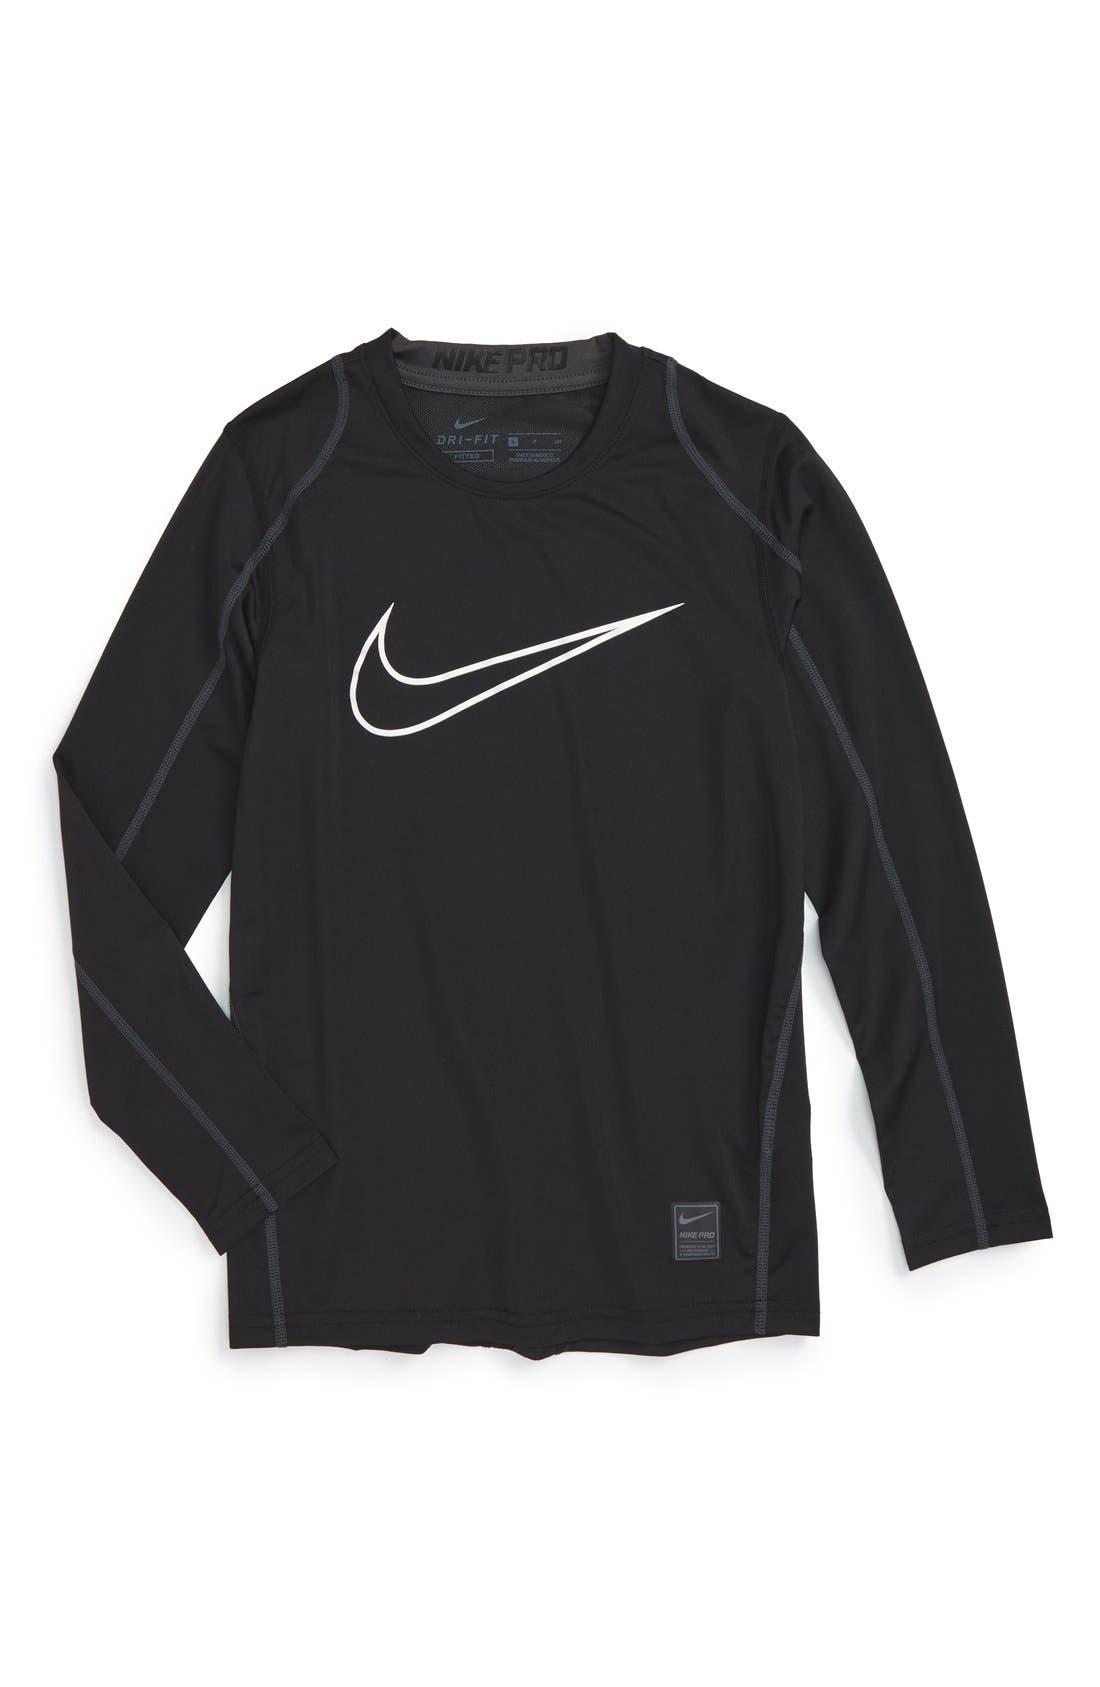 Cool Dri-FIT T-Shirt,                             Main thumbnail 1, color,                             Black/ Anthracite/ White